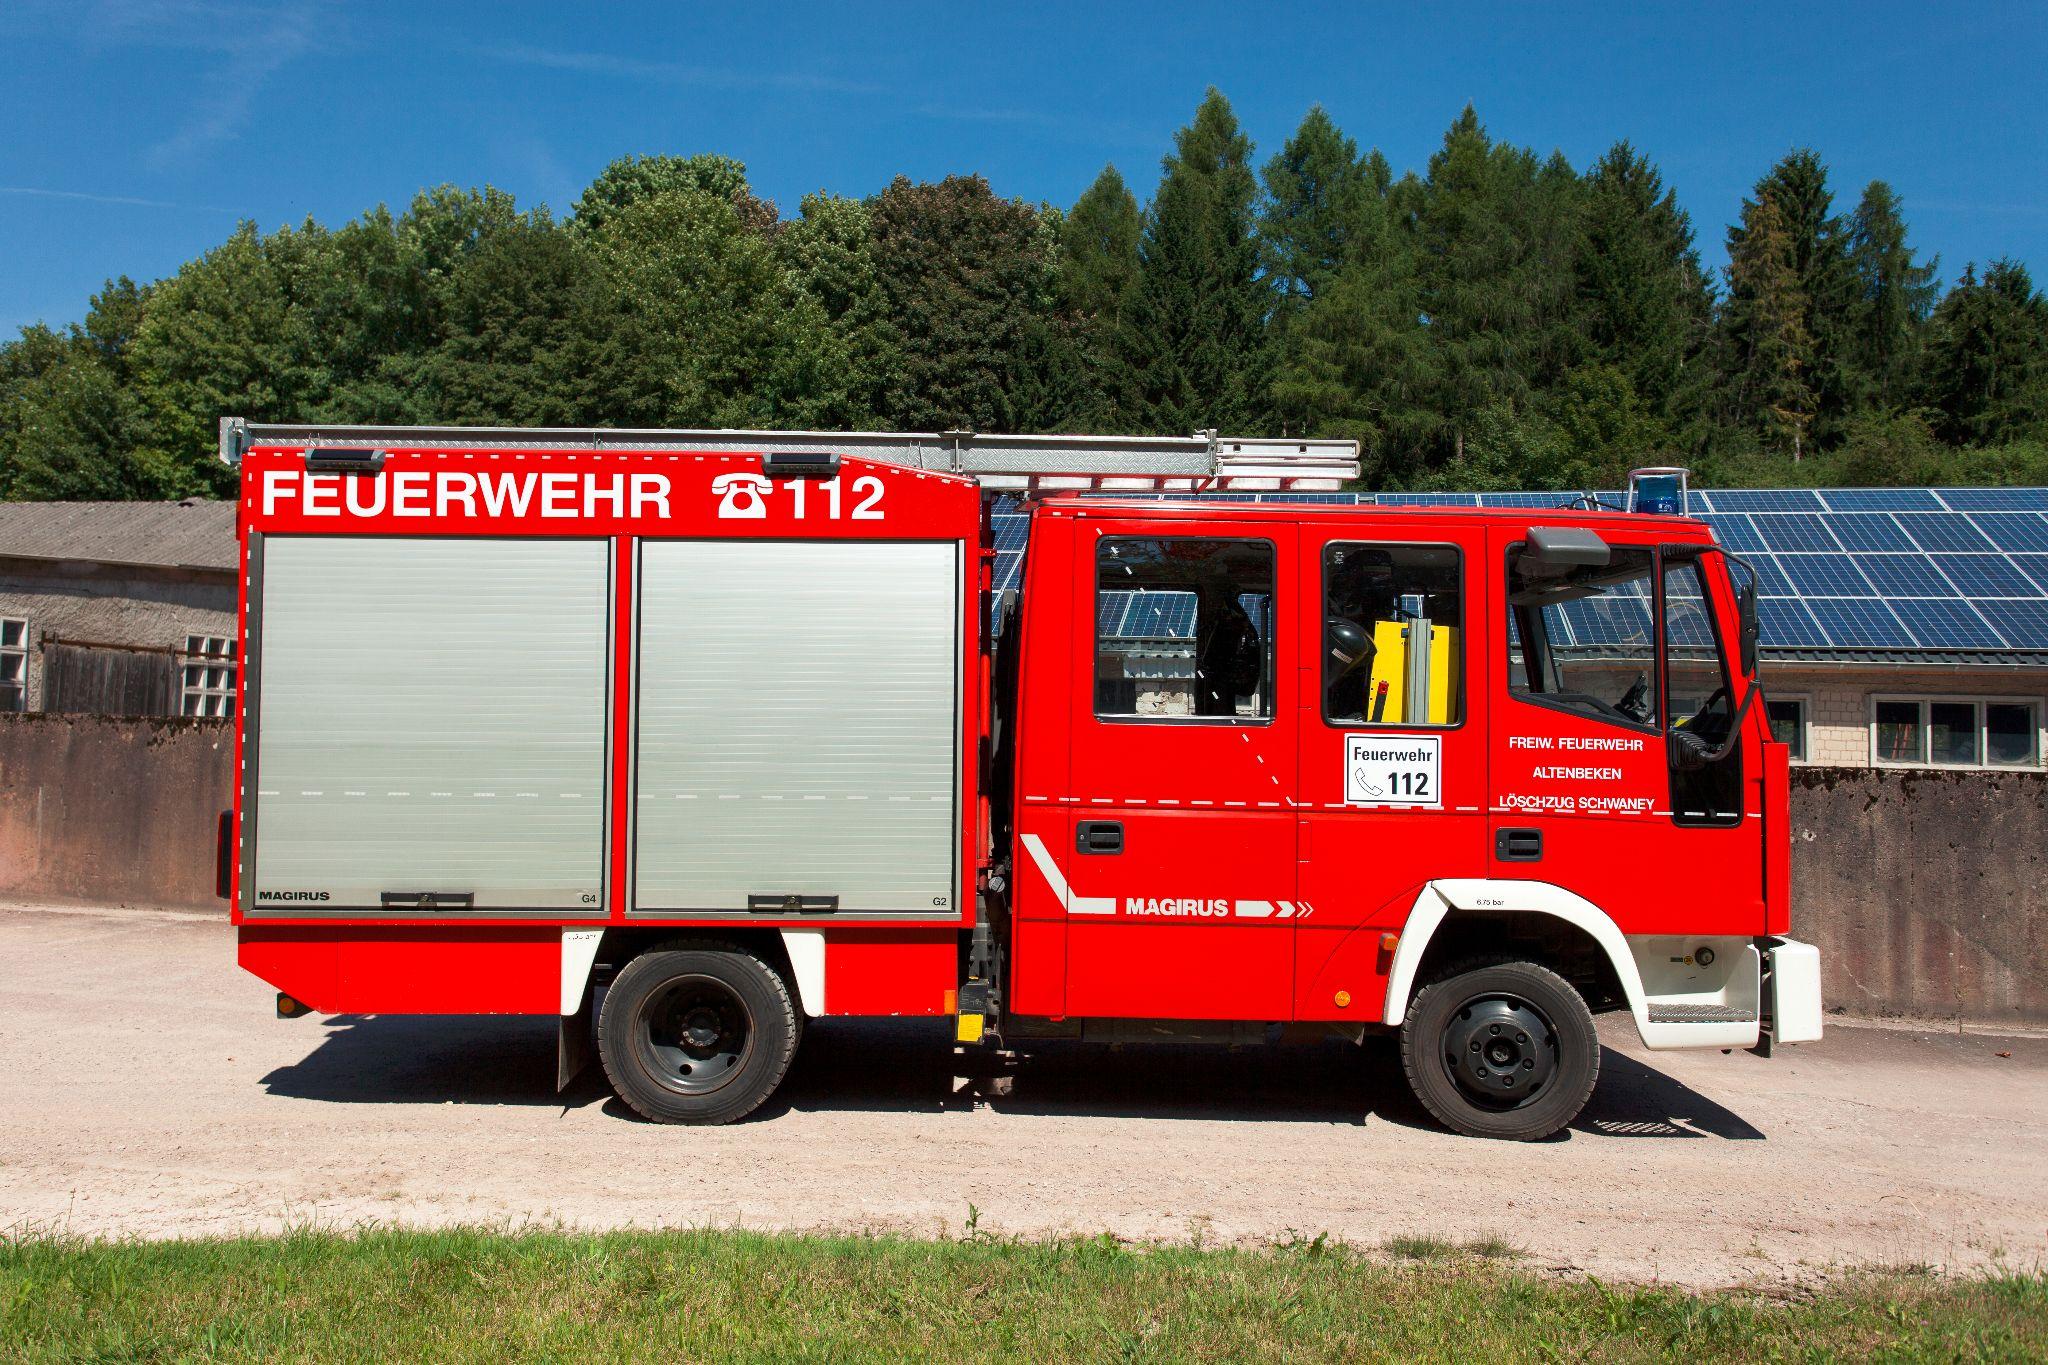 LF Schwaney